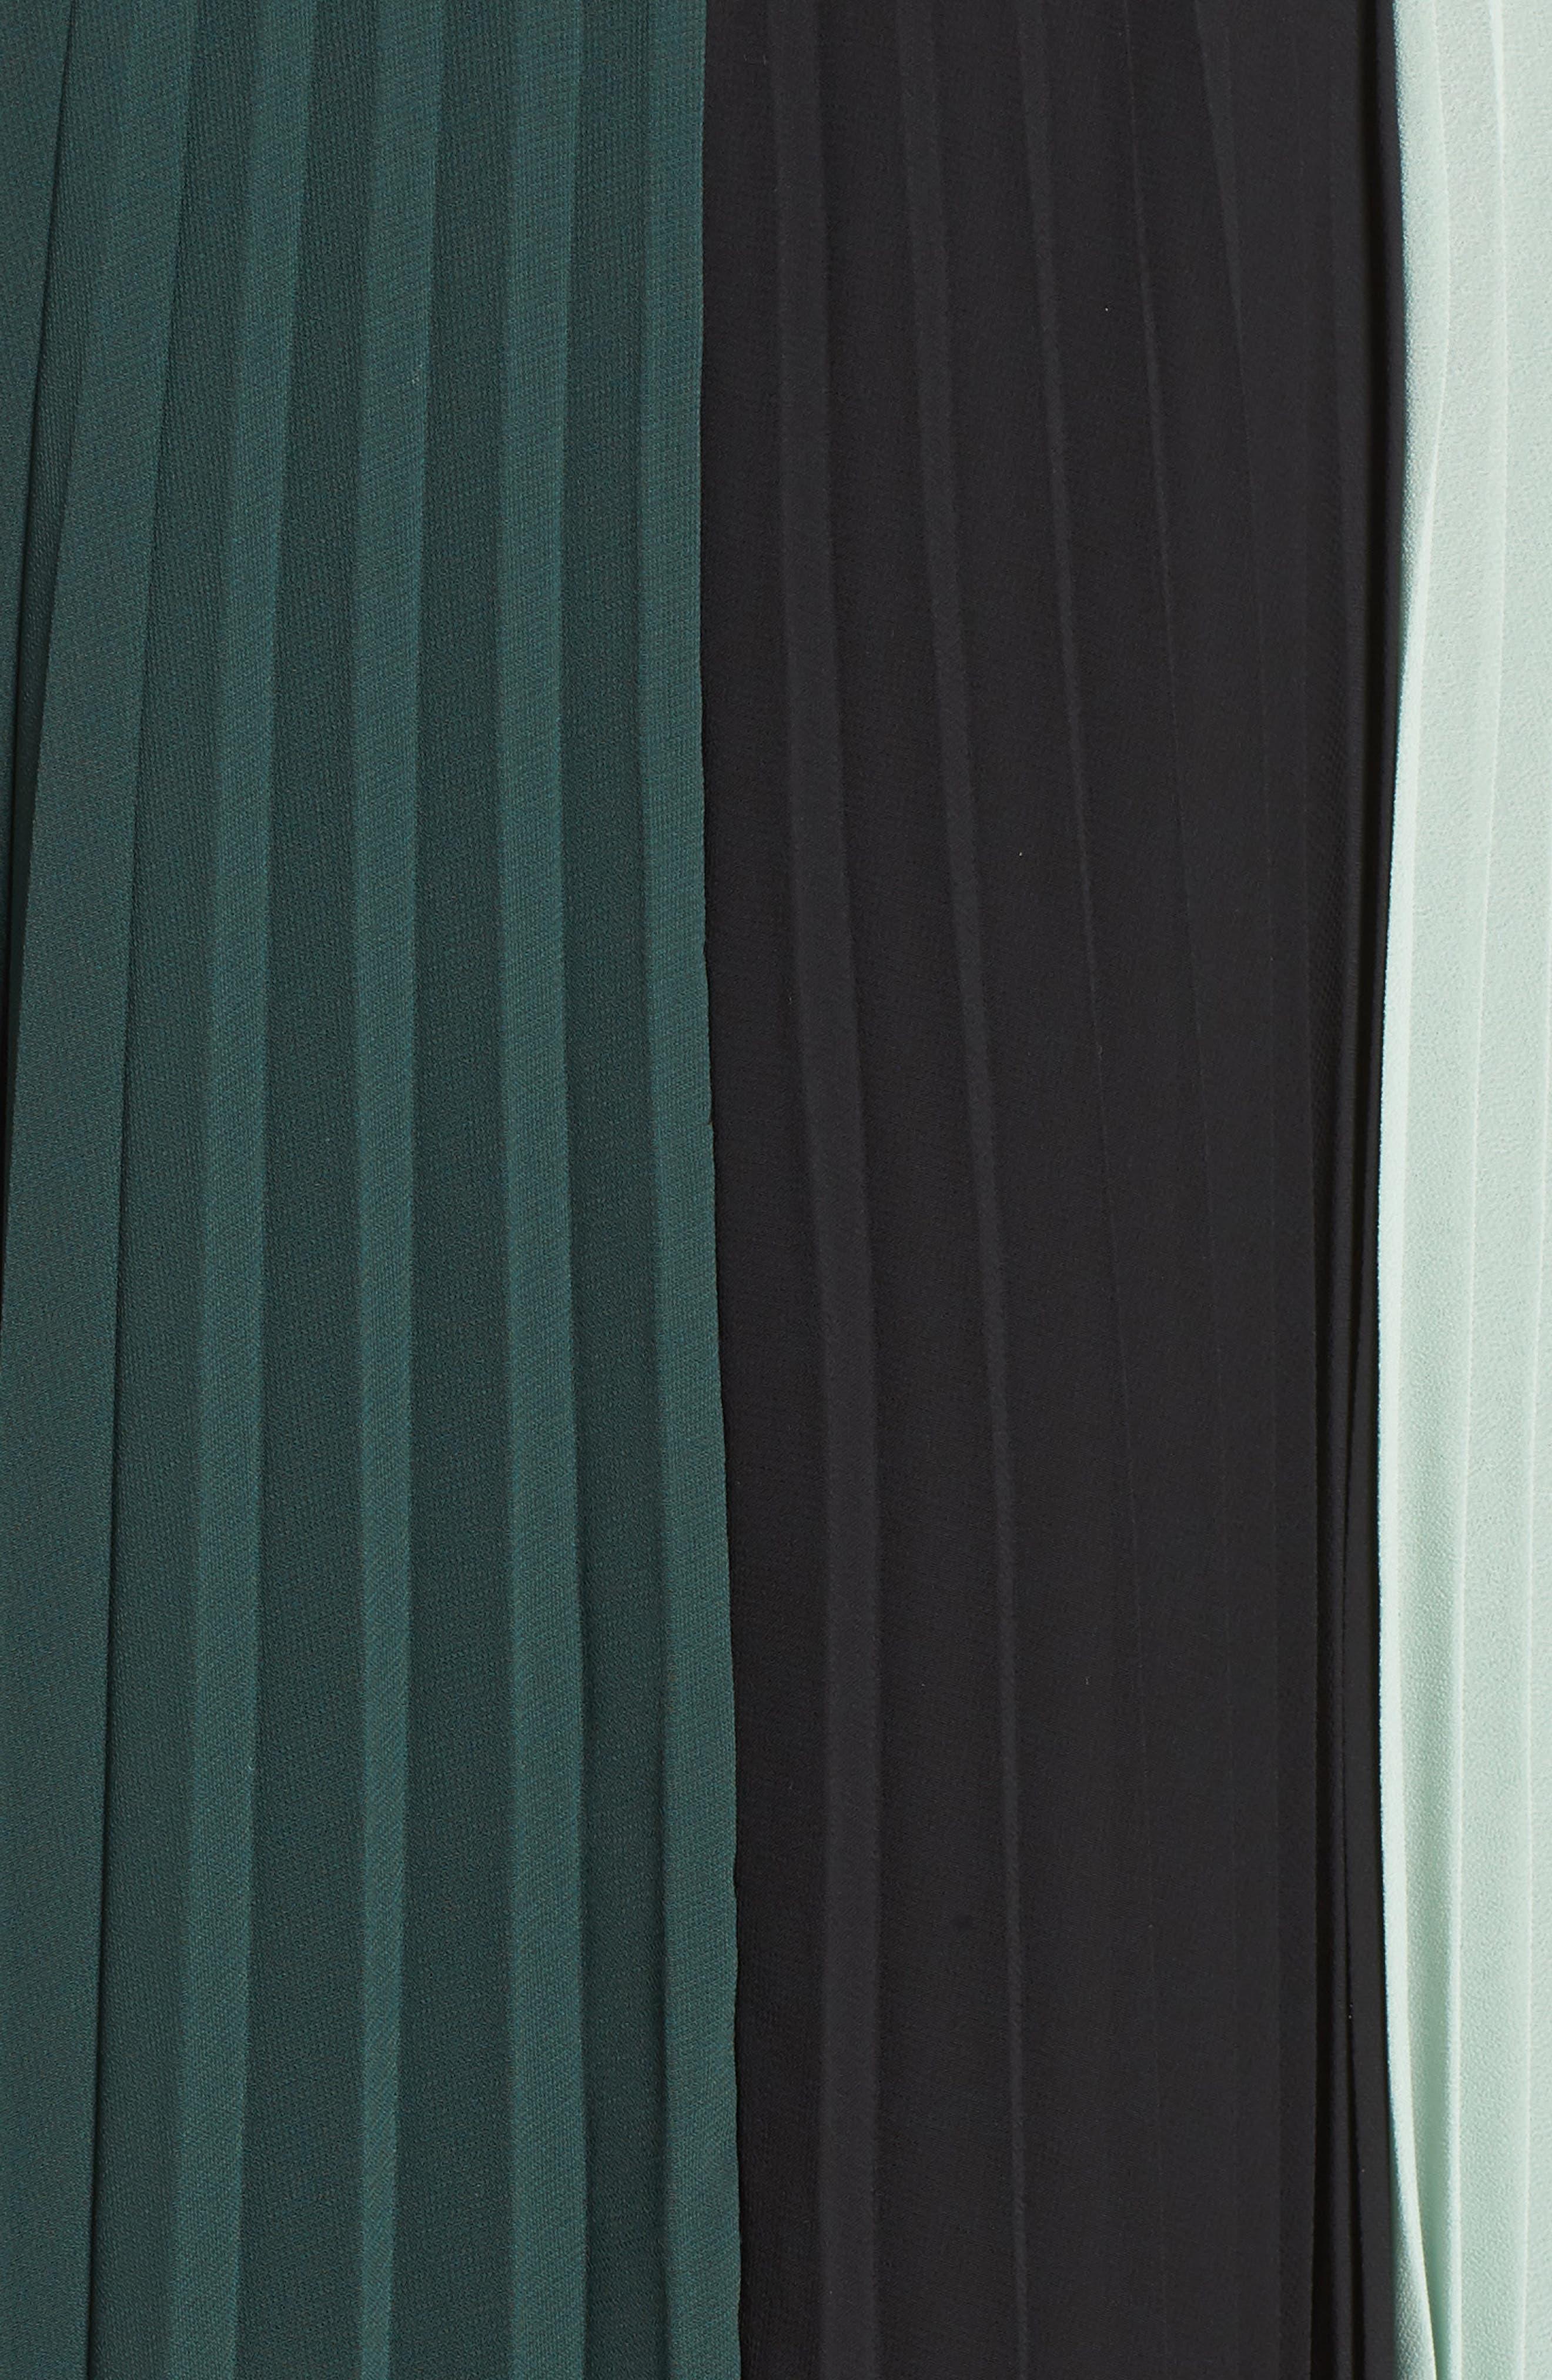 x Atlantic-Pacific Colorblock Pleated Midi Skirt,                             Alternate thumbnail 5, color,                             GREEN- BLACK COLORBLOCK